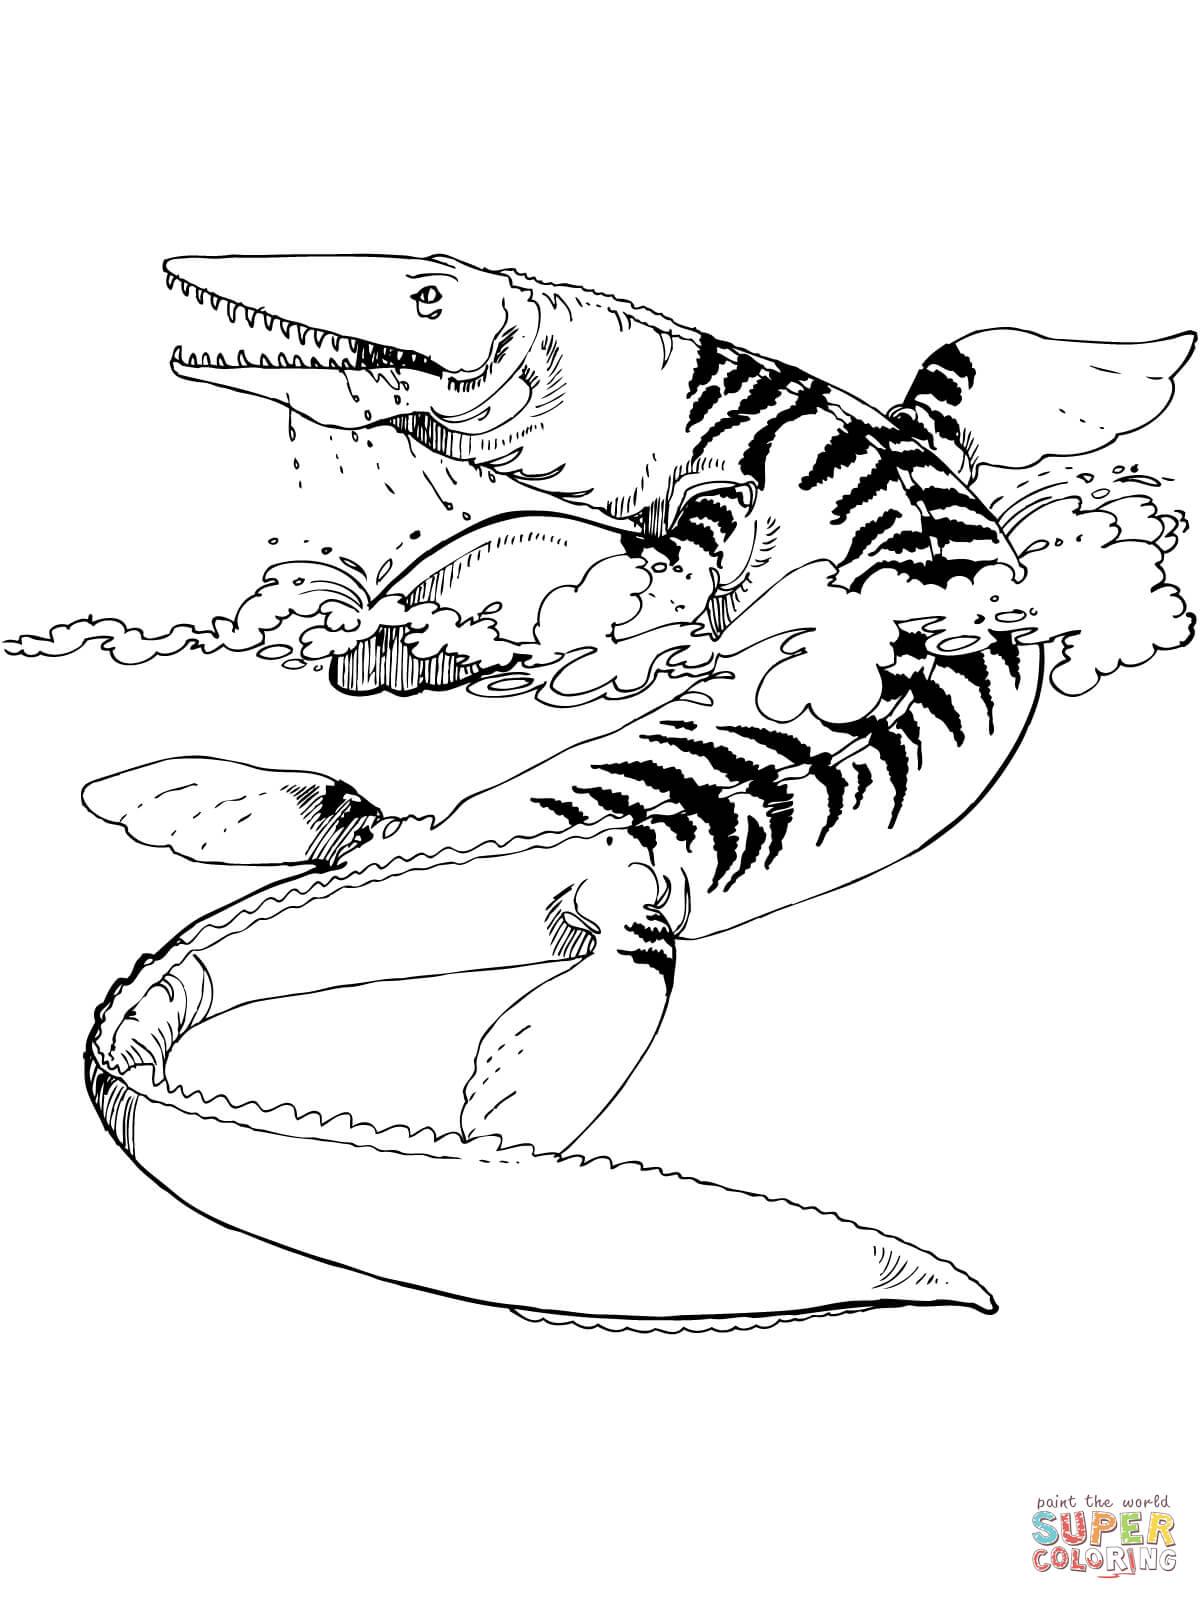 Juegos De Dinosaurios Rex